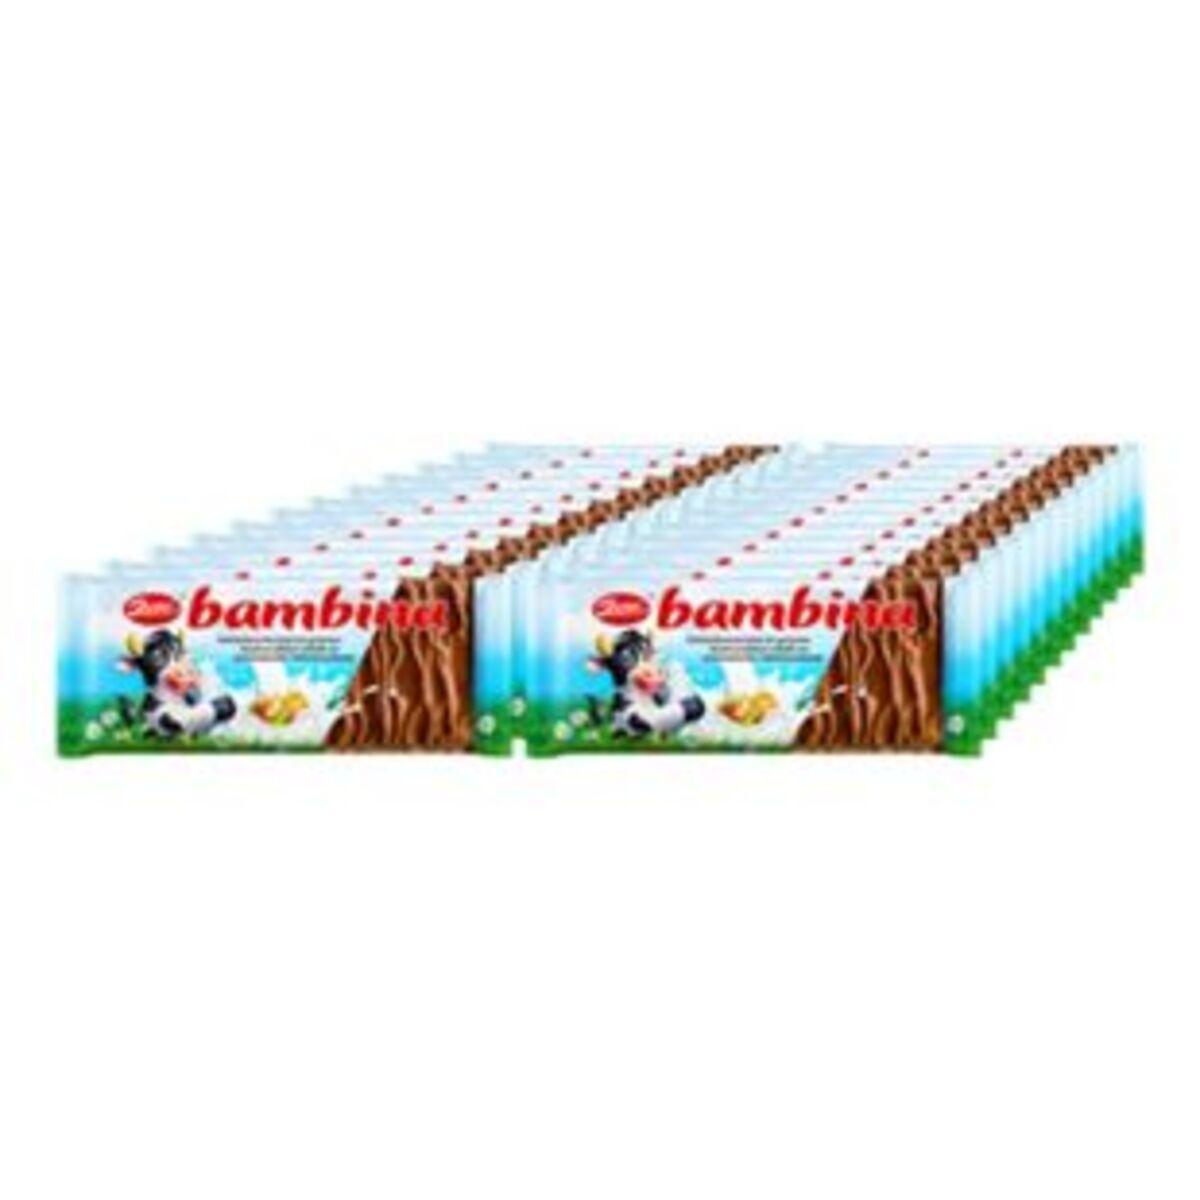 Bild 2 von Zetti Bambina Schokolade 100 g, 24er Pack